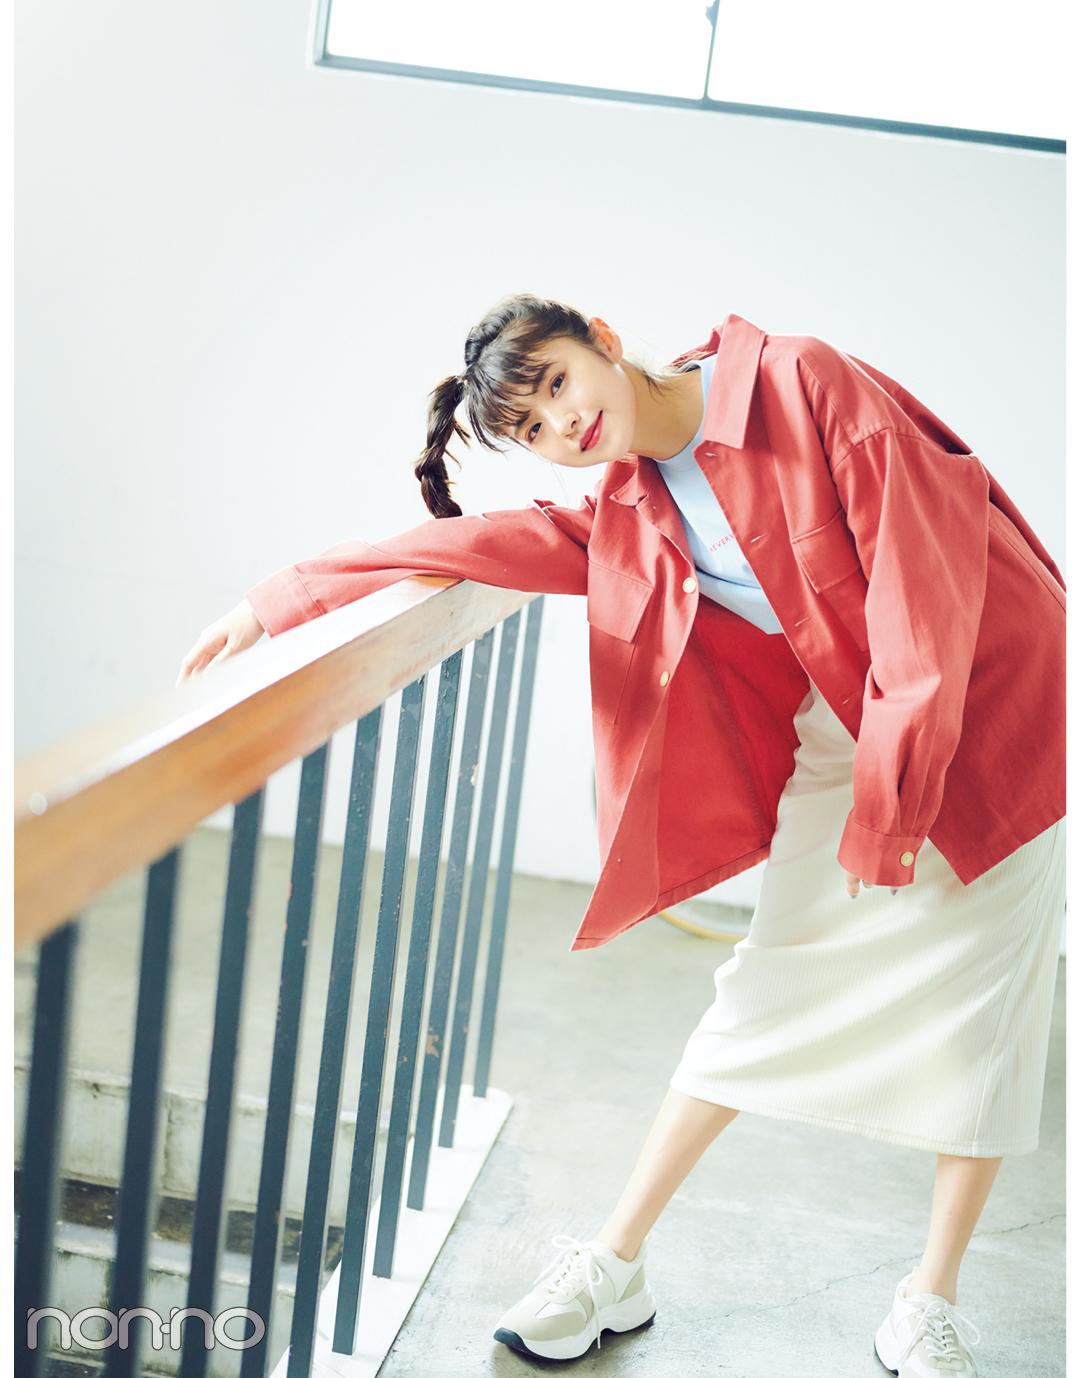 【GU】2020春の新作&トレンドコーデフォトギャラリー_1_4